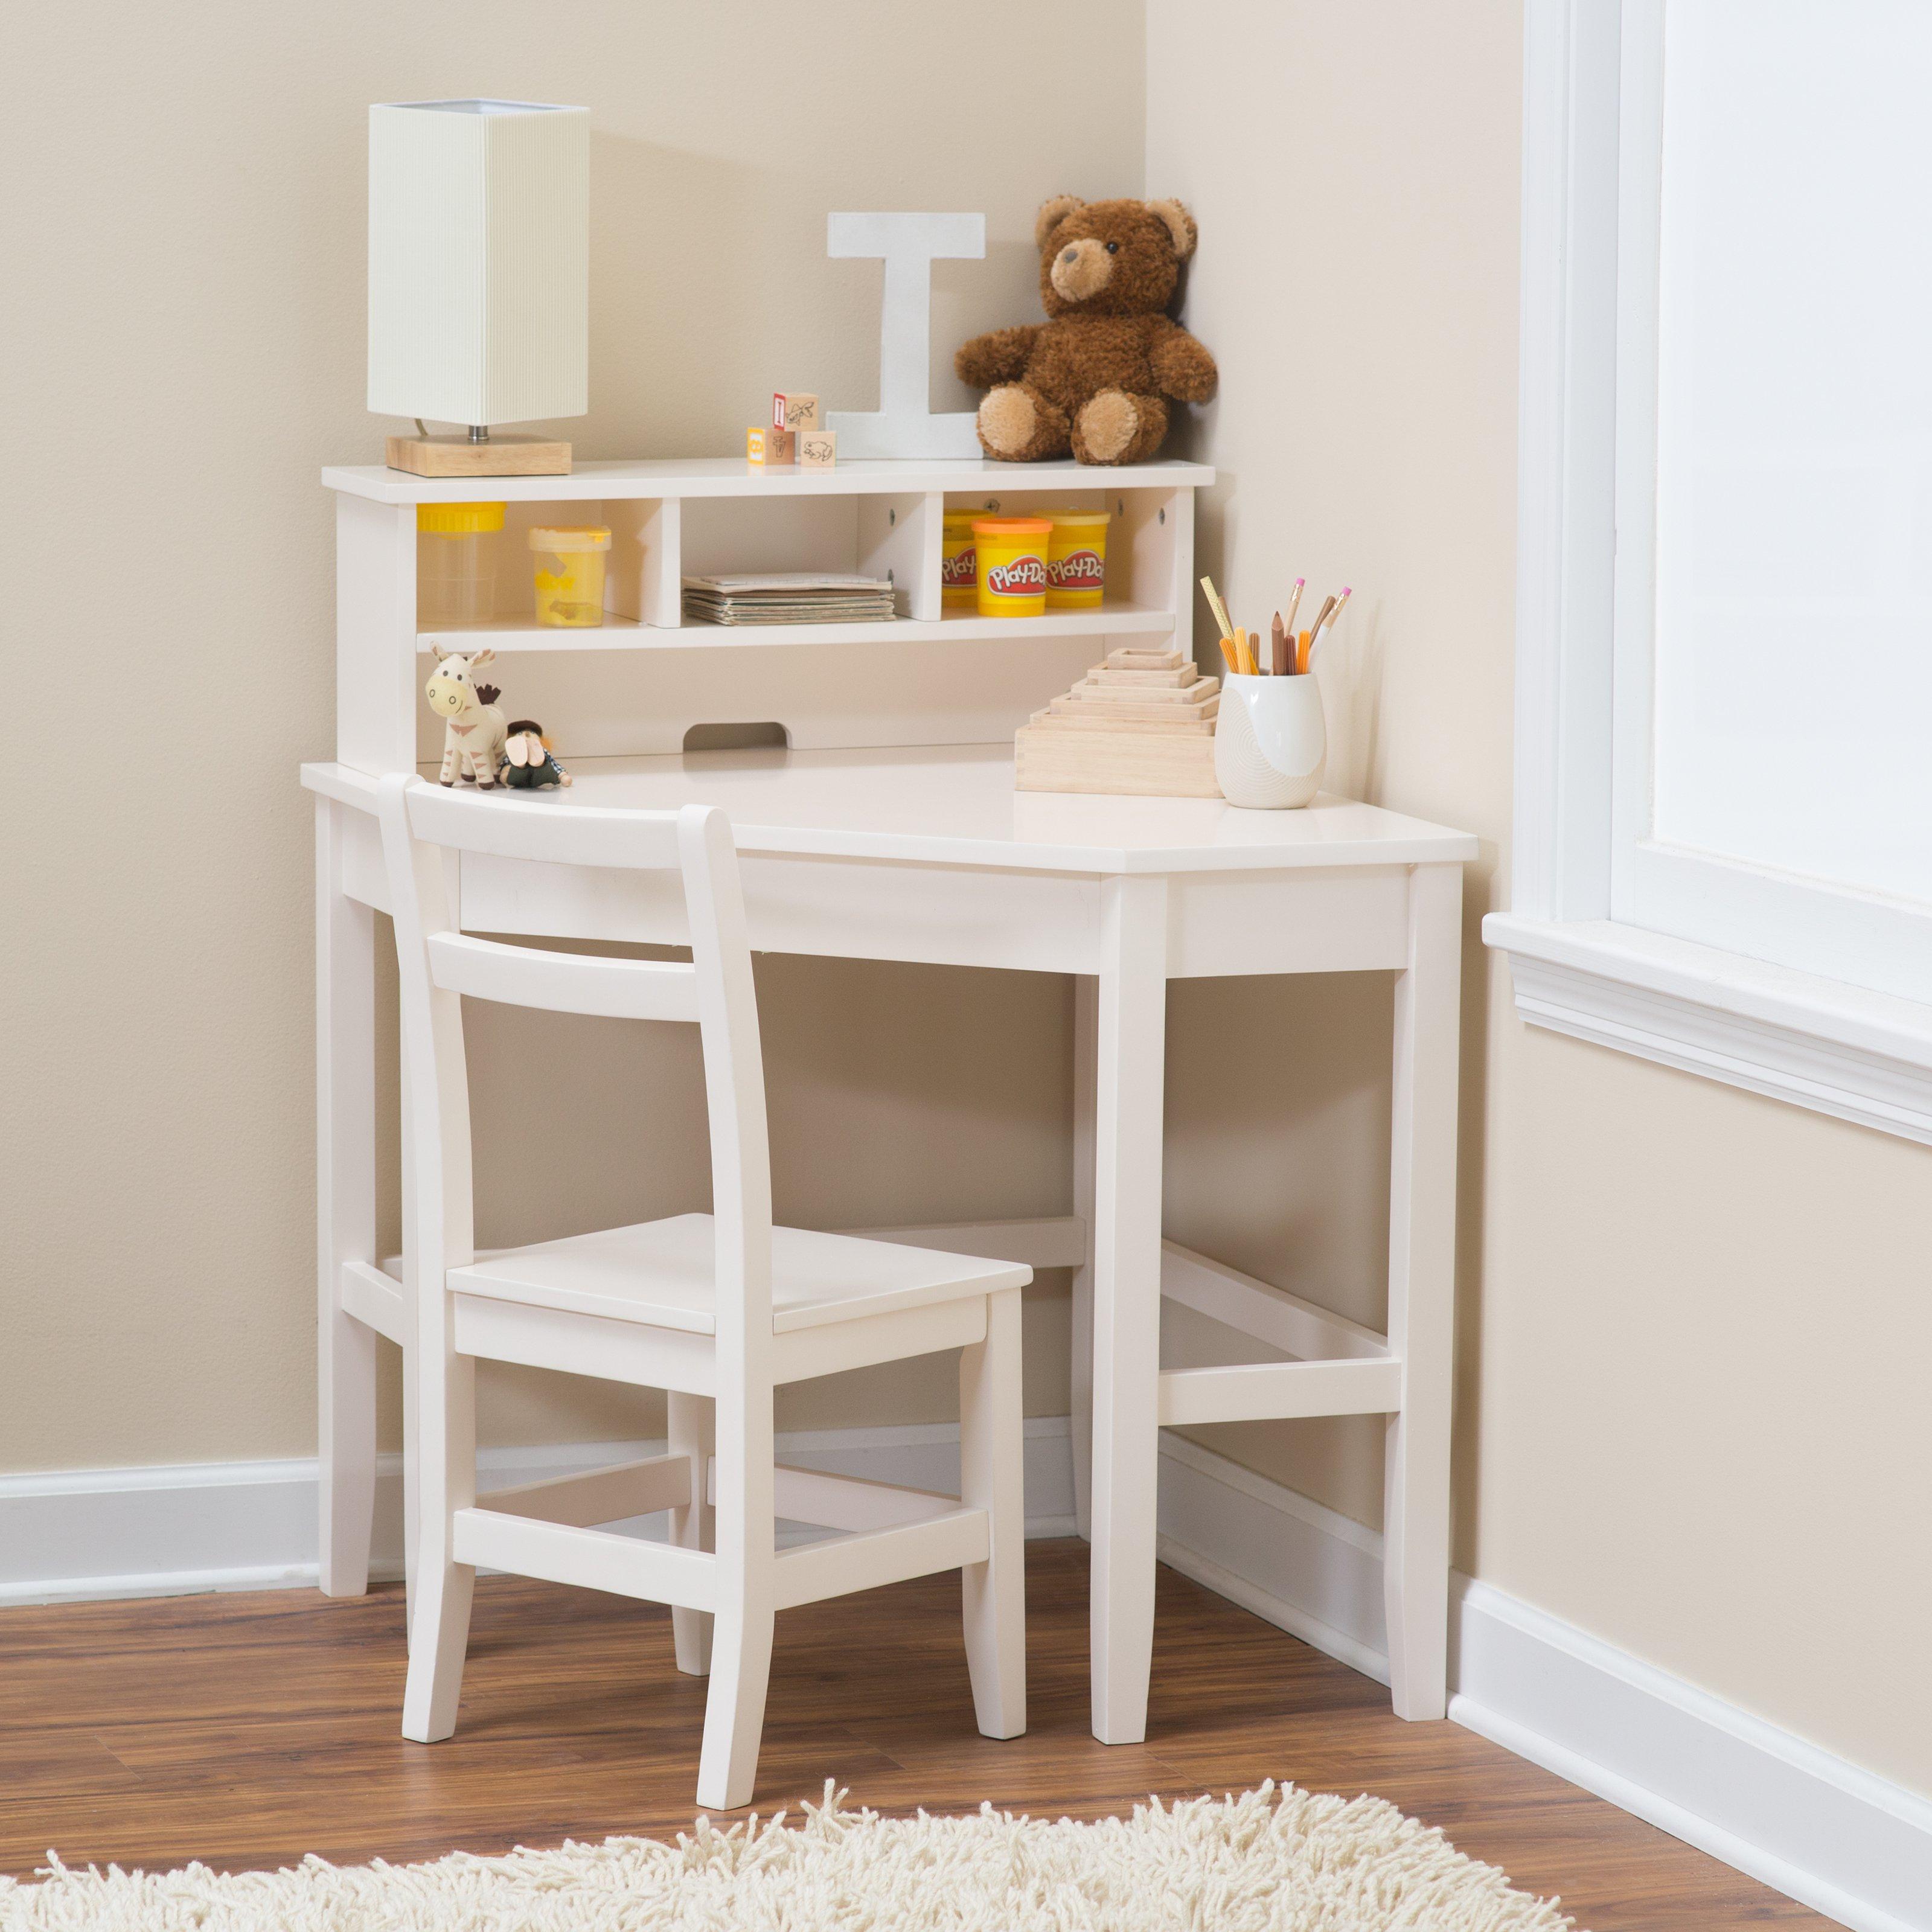 childrens desks guidecraft media desk u0026 chair set - espresso | hayneedle ZIXNYHO